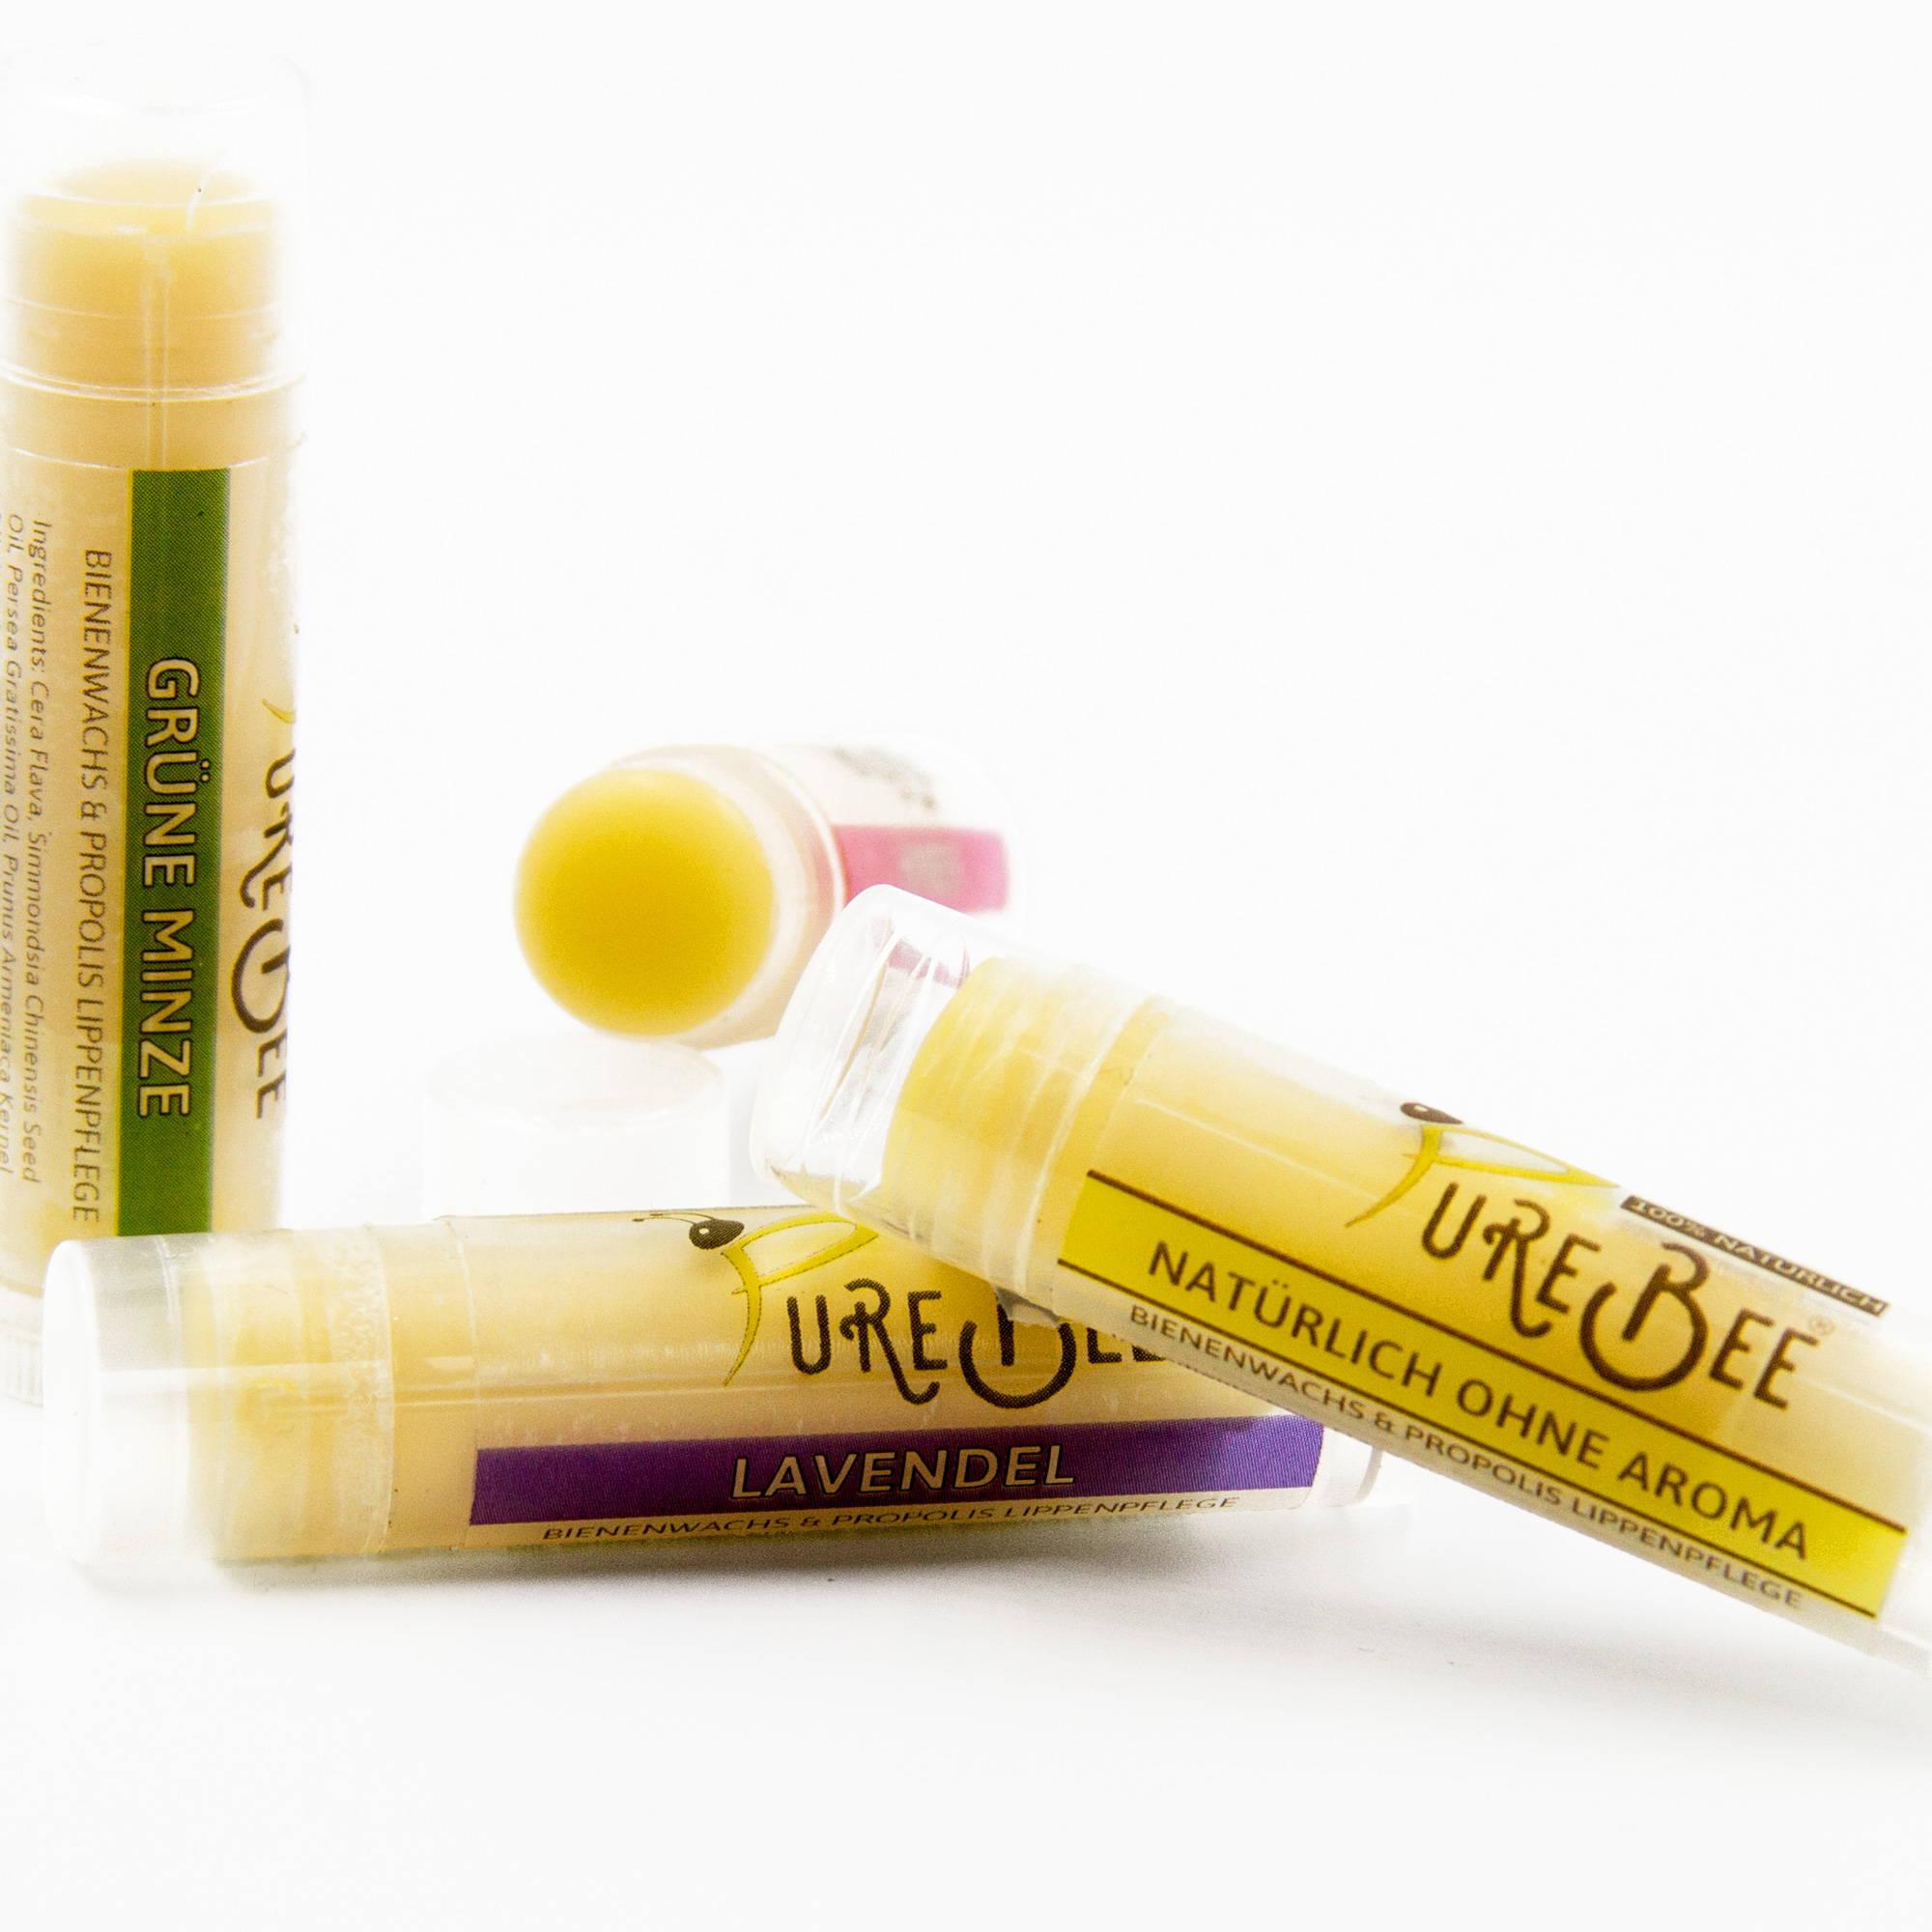 PureBee Lippenpflege